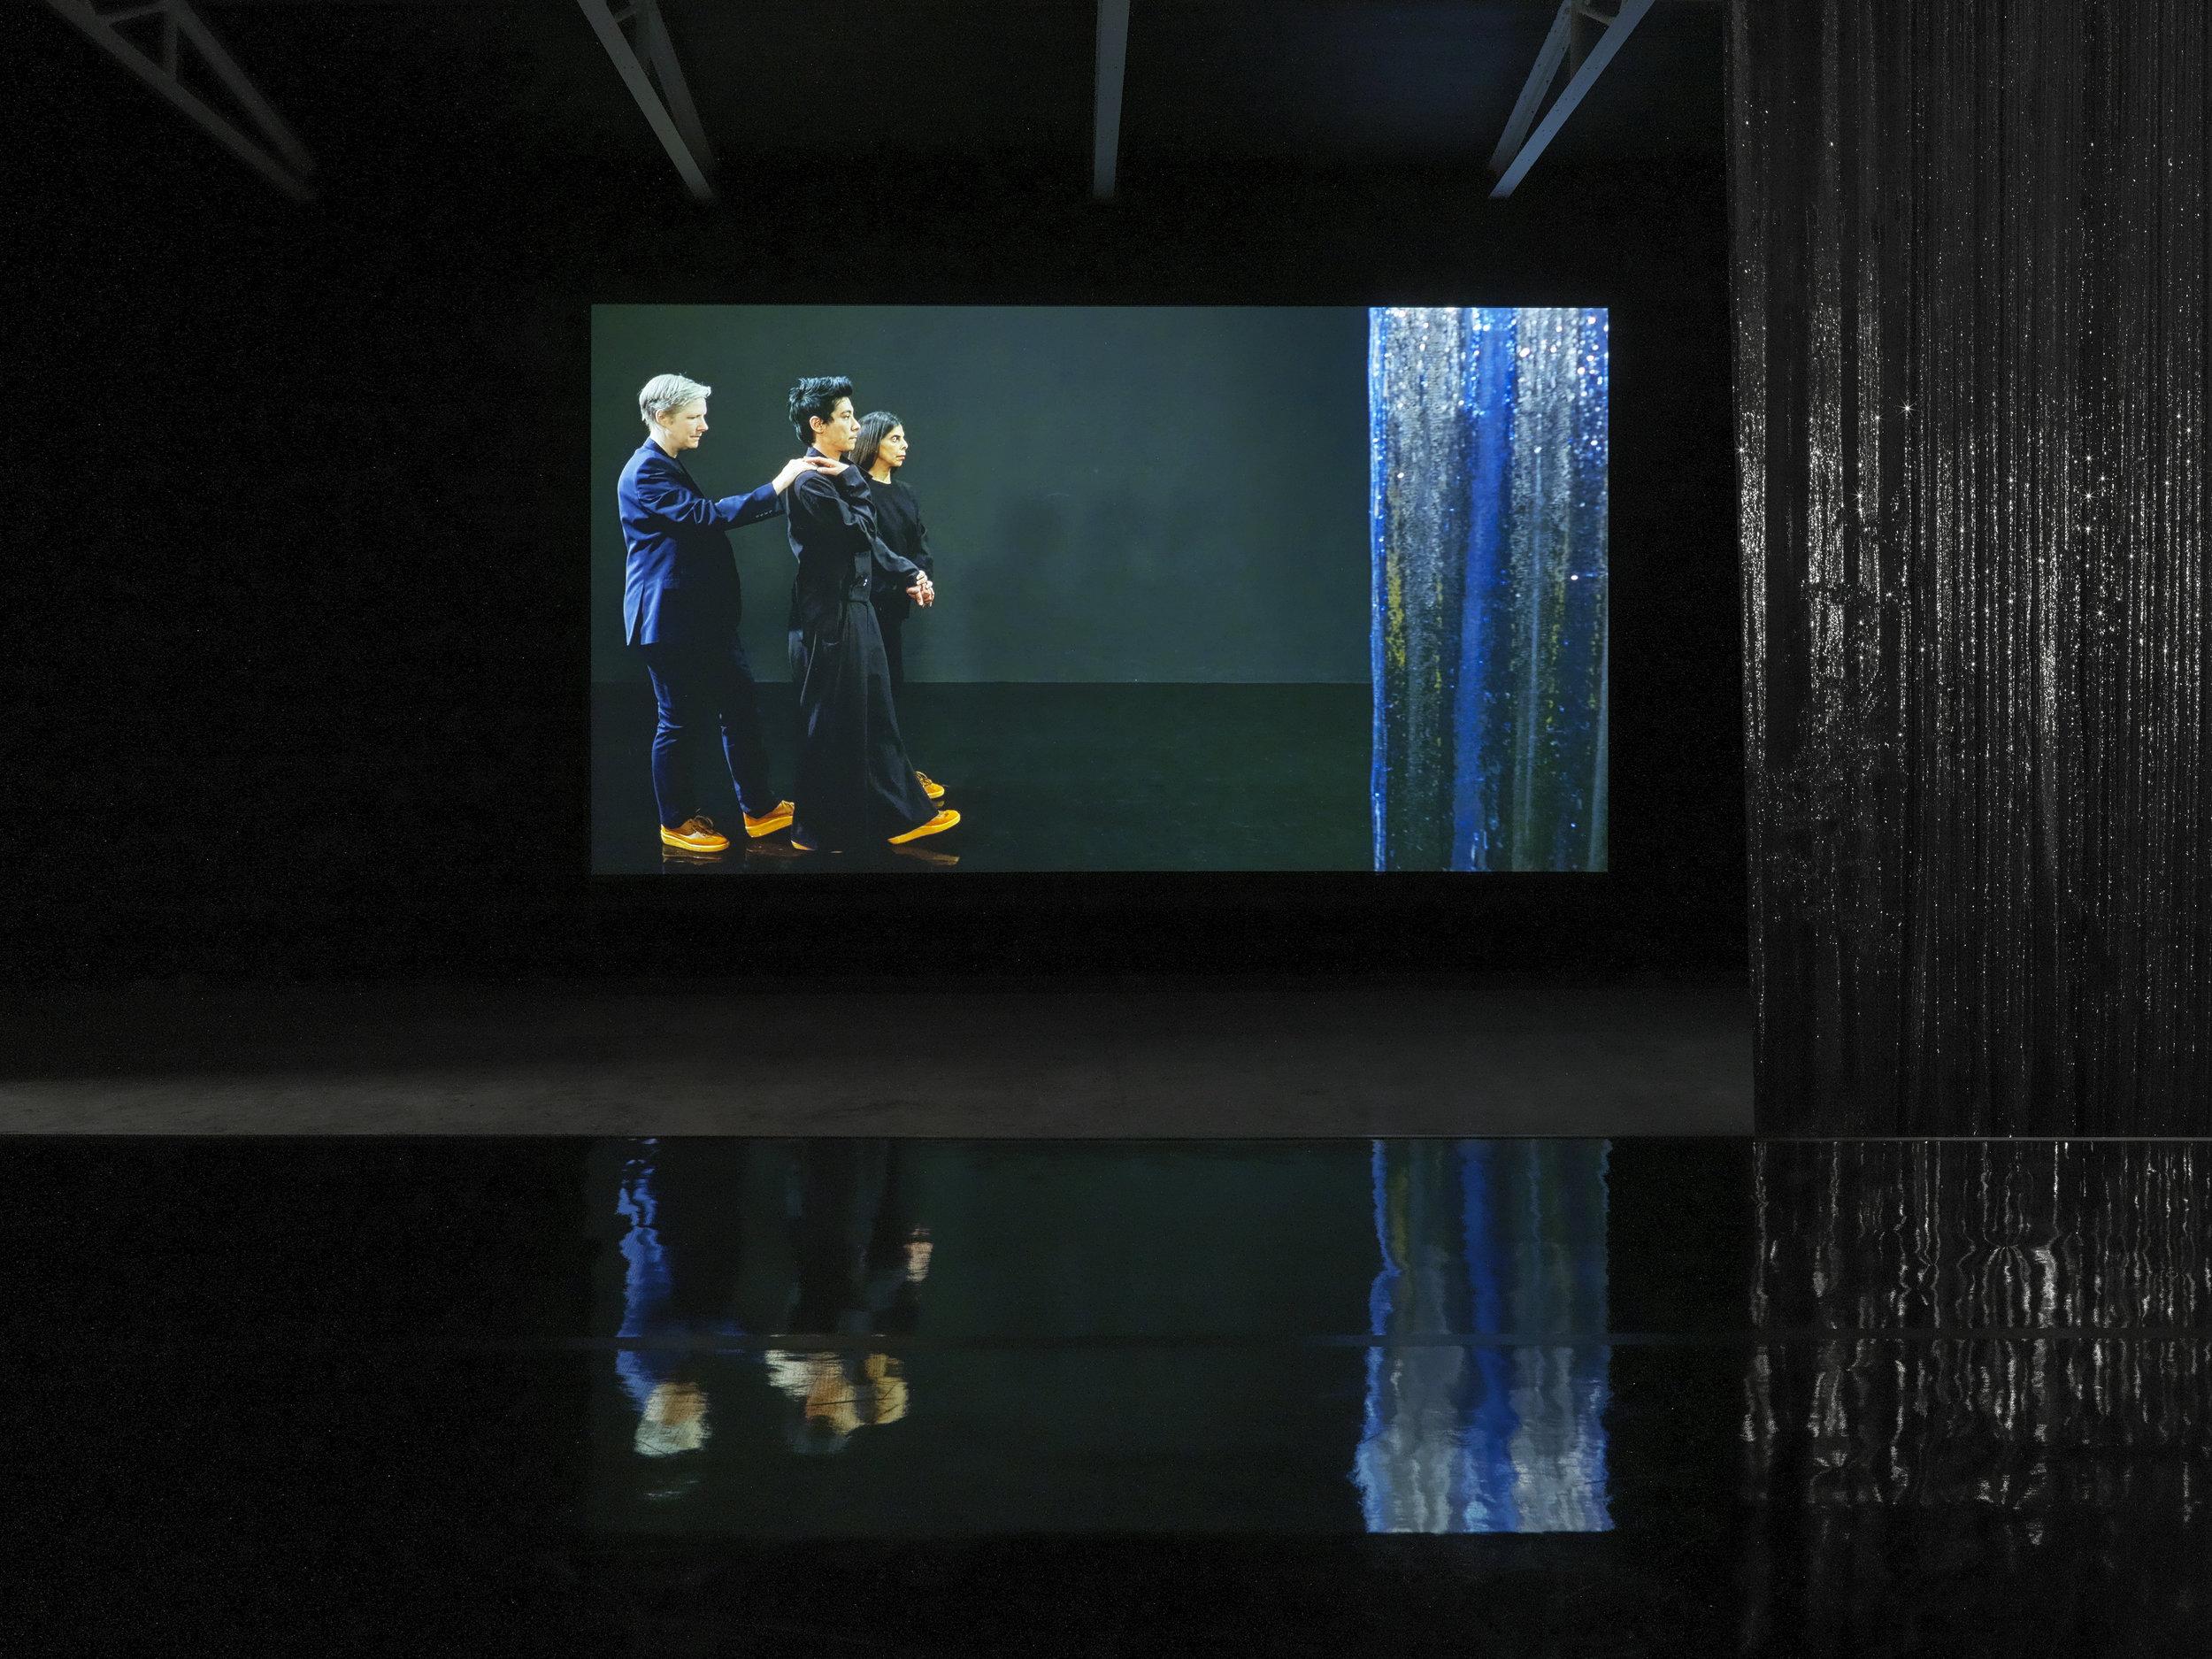 La Biennale di Venezia | Swiss Pavilion | Pauline Boudry & Renate Lorenz | 2019